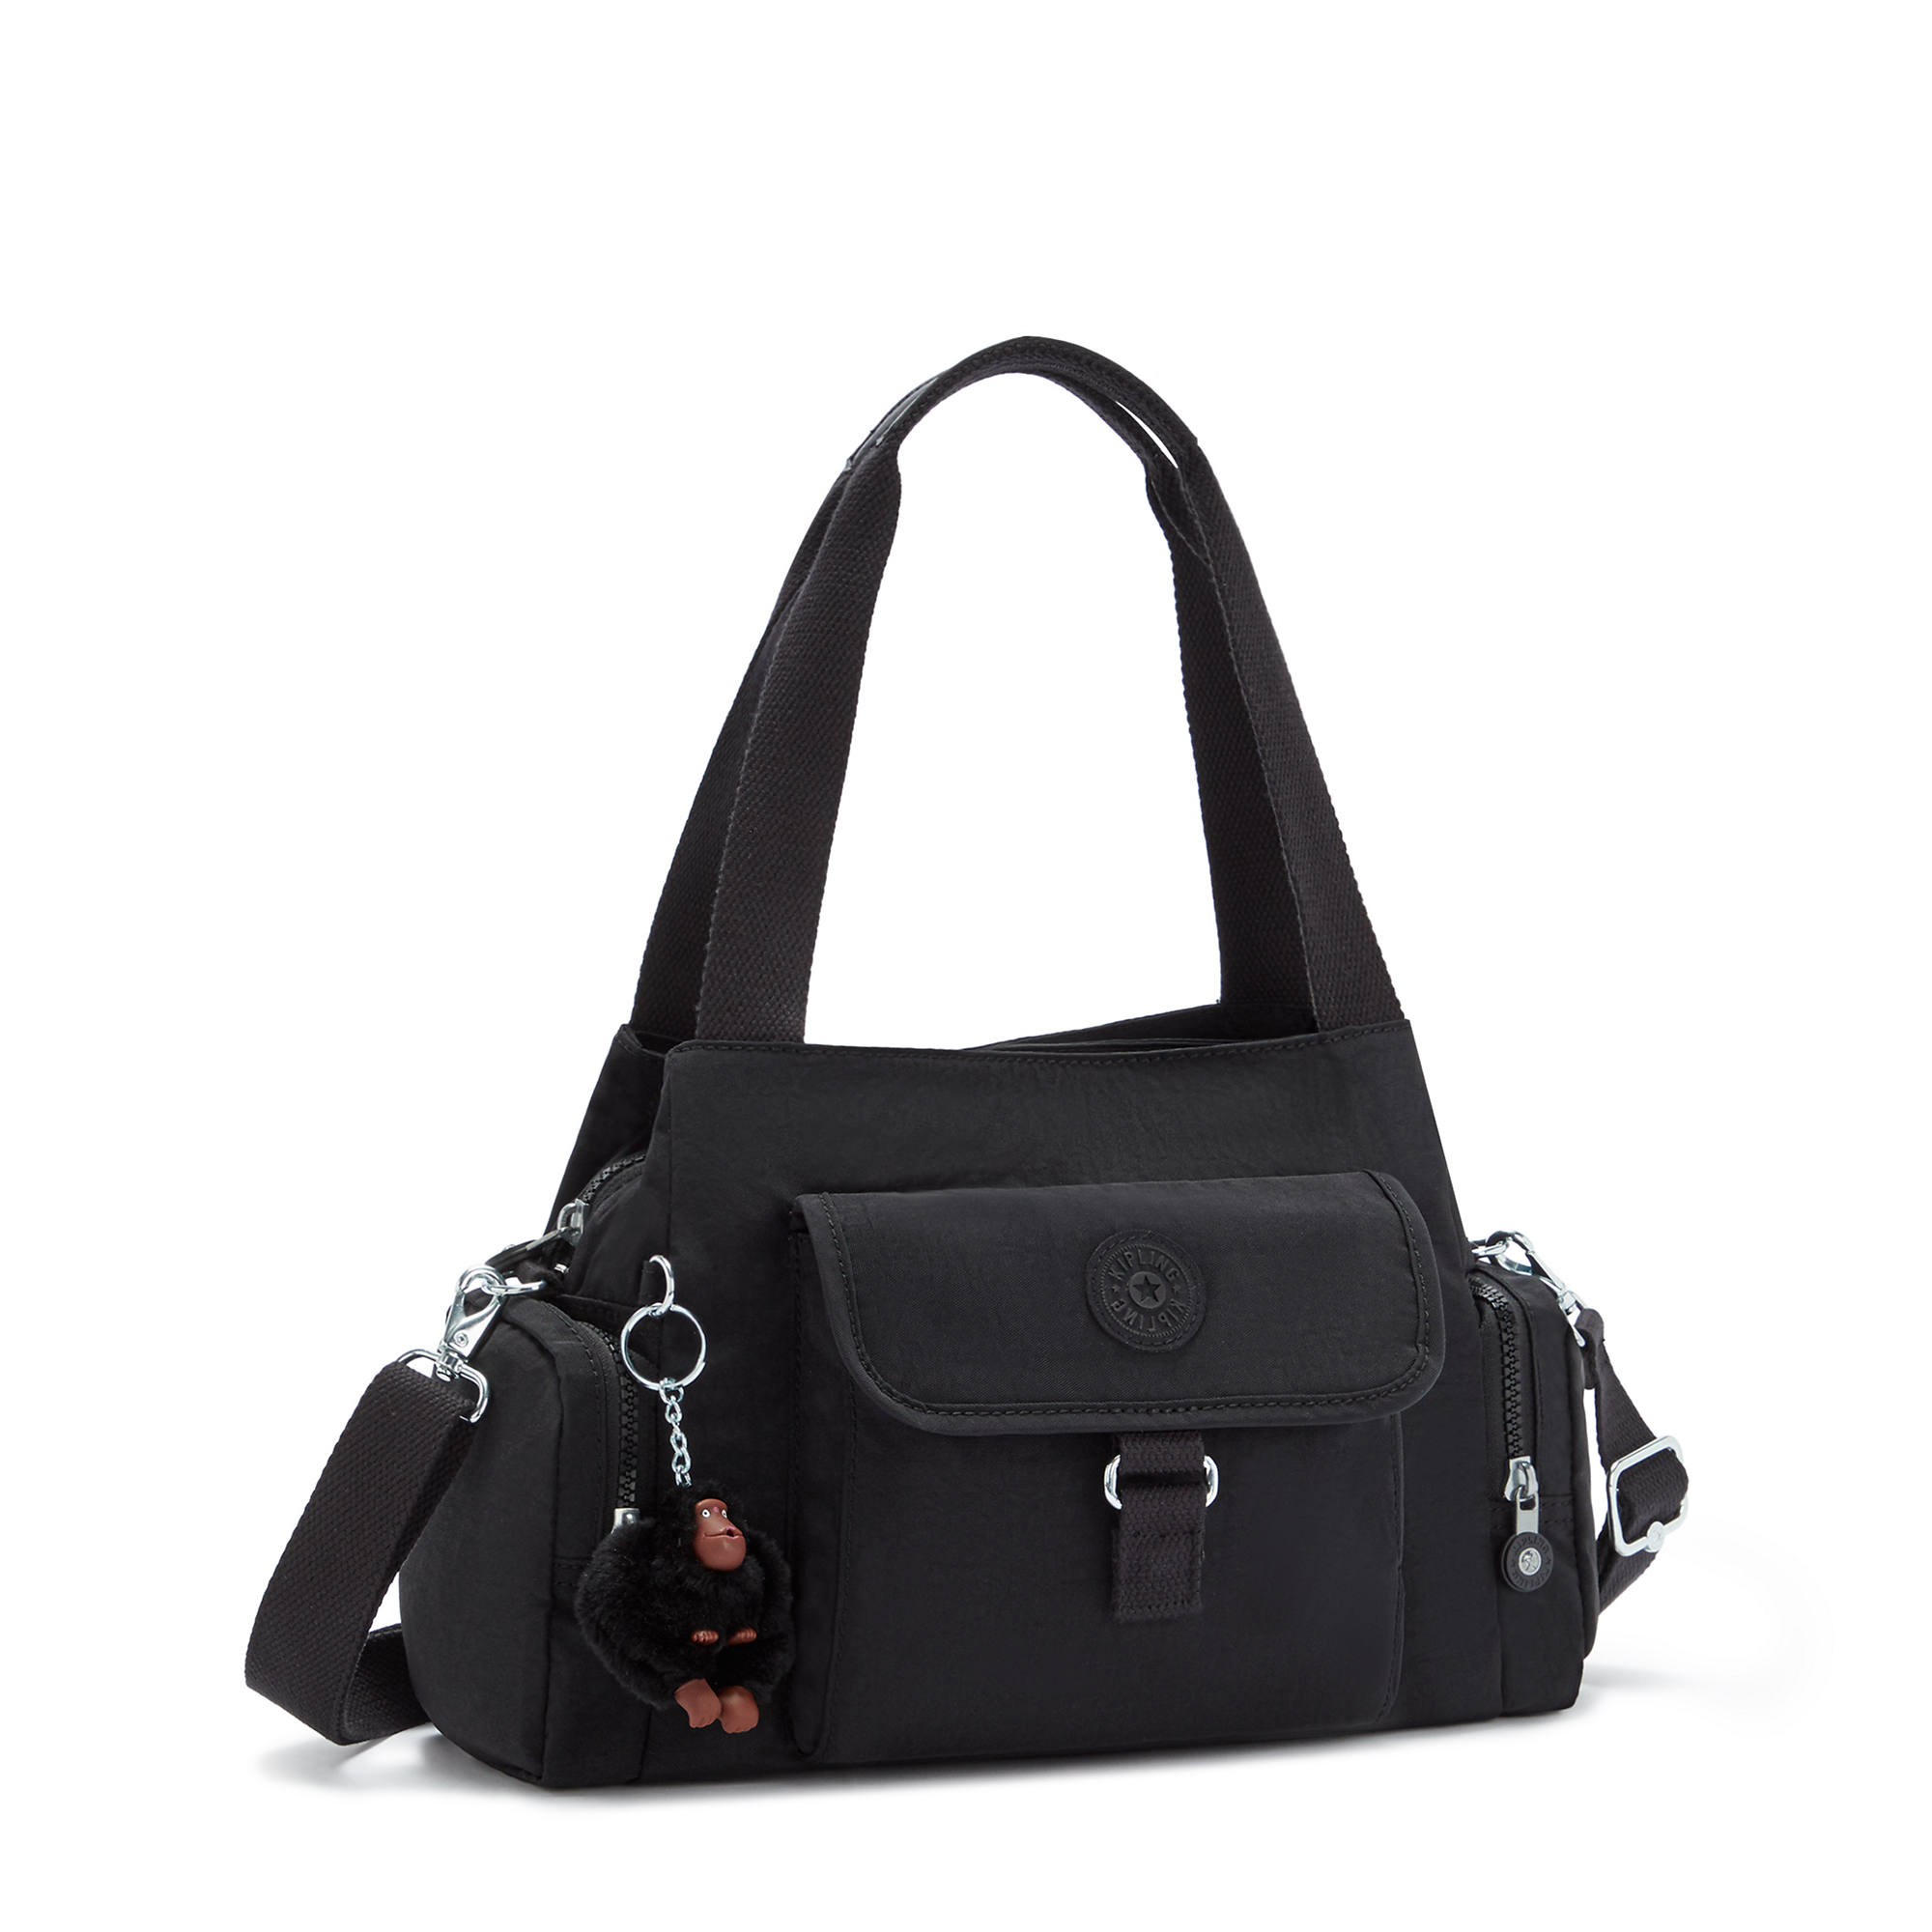 Kipling-Felix-Large-Handbag miniature 11